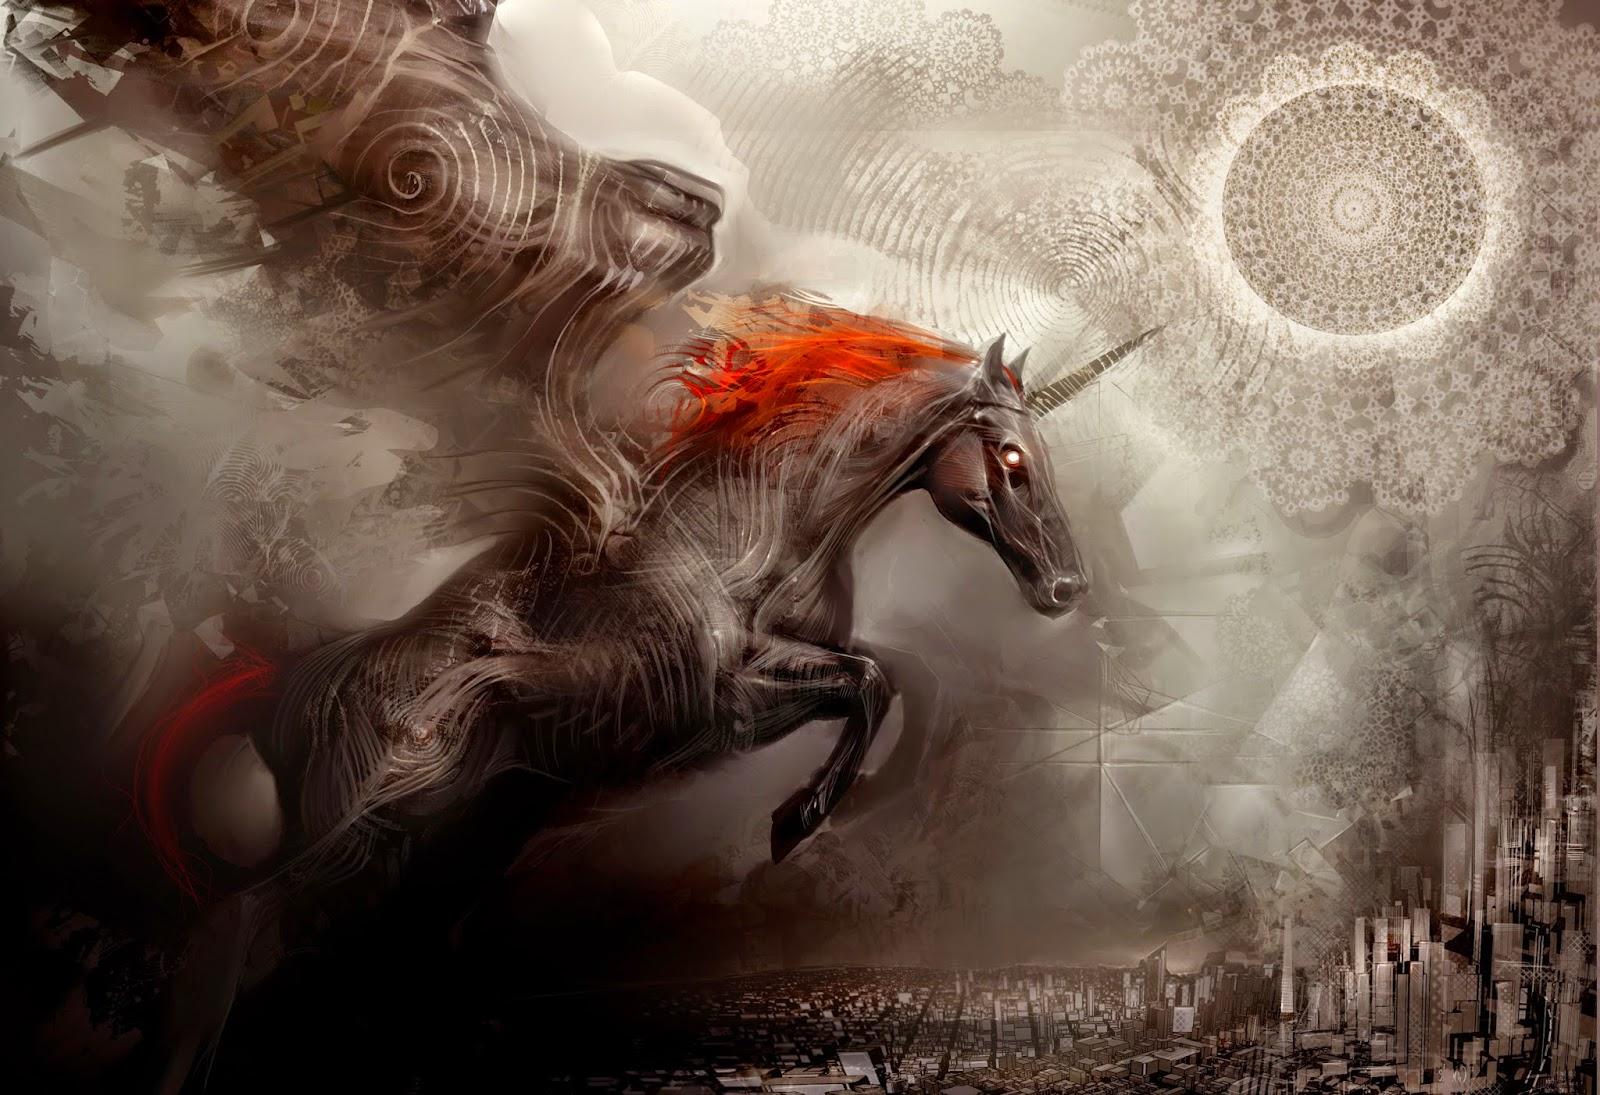 Simple   Wallpaper Horse Warrior - Flying%2BHours%2B(3)  Trends_6178100.jpg